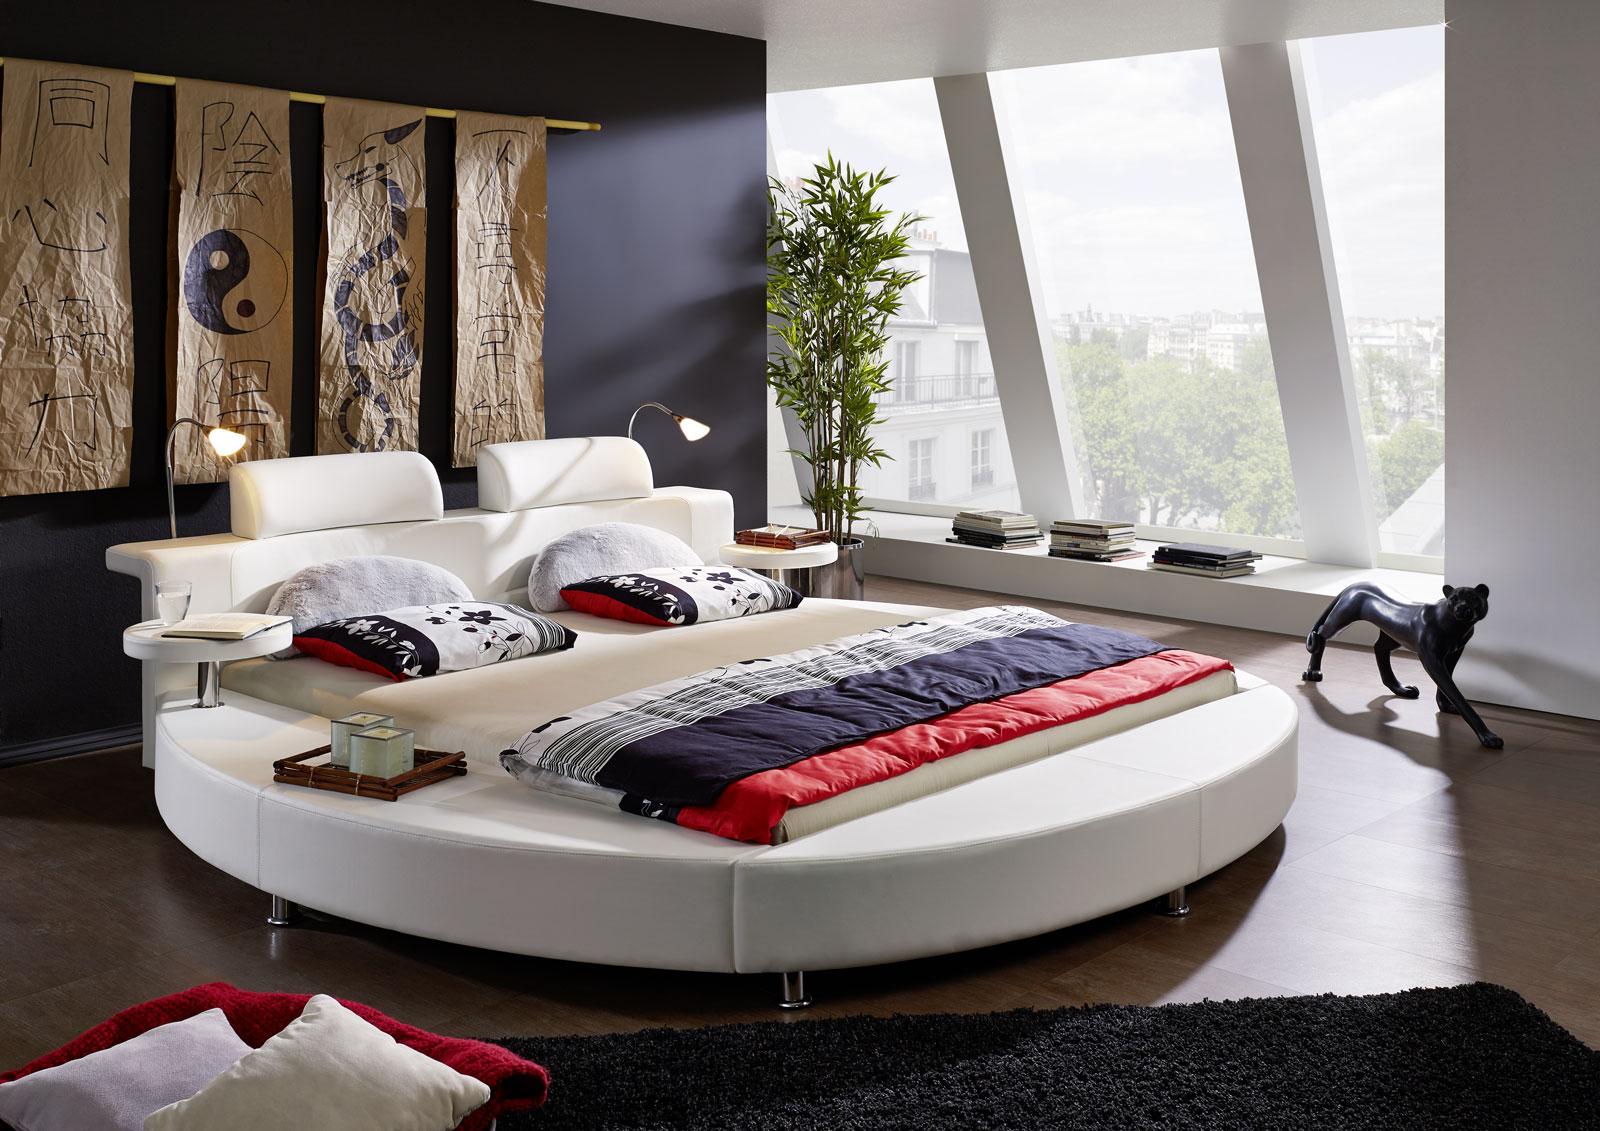 Boxspringbett design rund  SAM® Rundbett Doppelbett 160 x 200 cm 2 Leselampen Weiß Classico ...